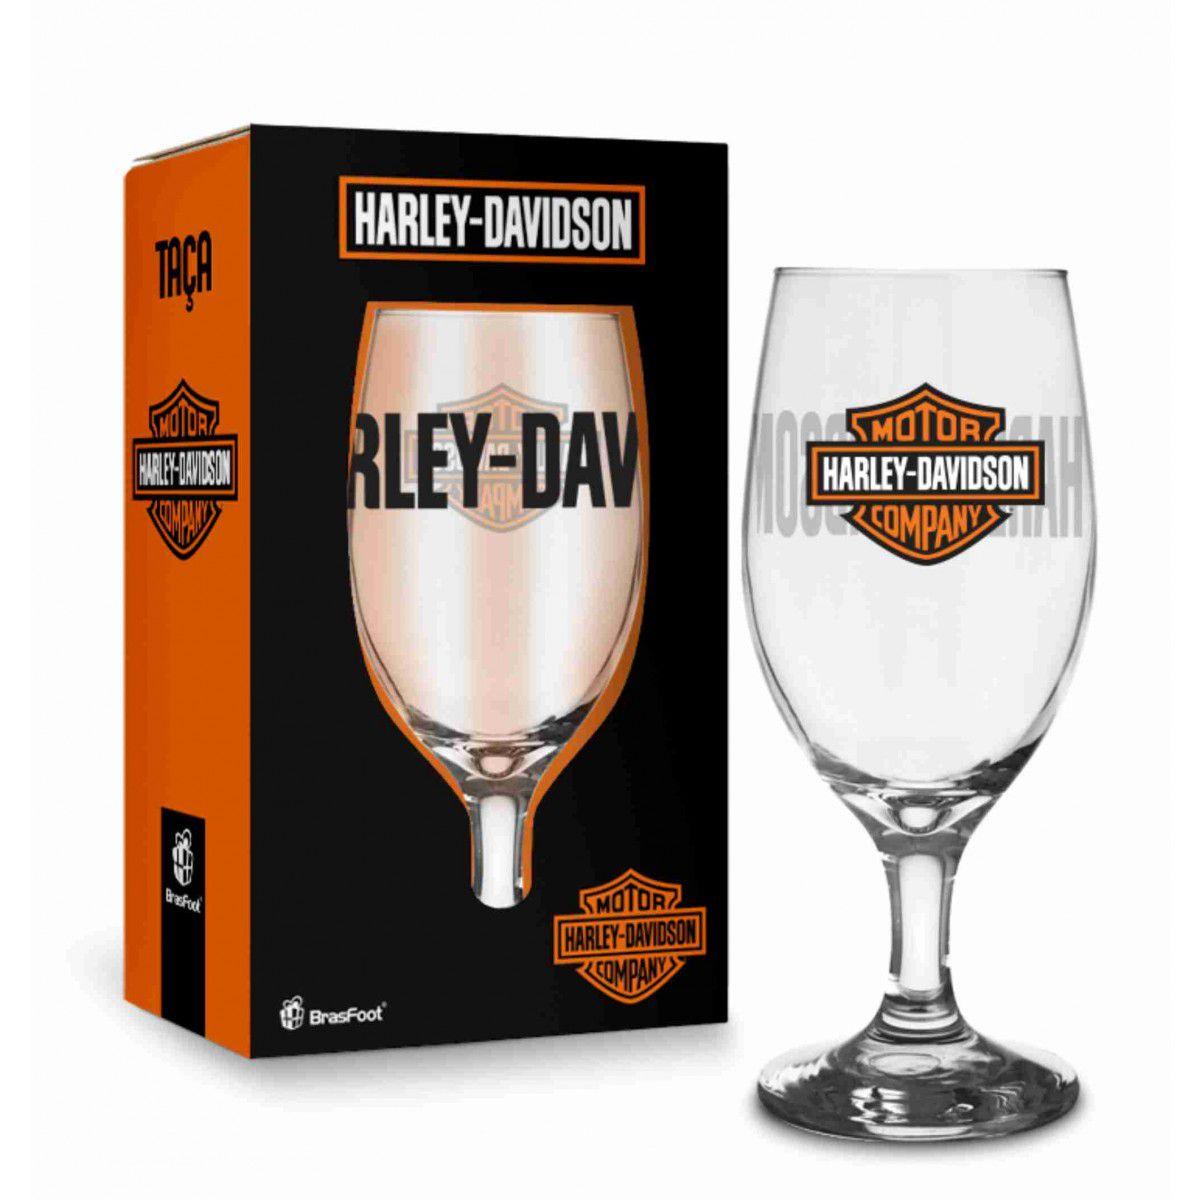 Taça Windsor - Harley Davidson